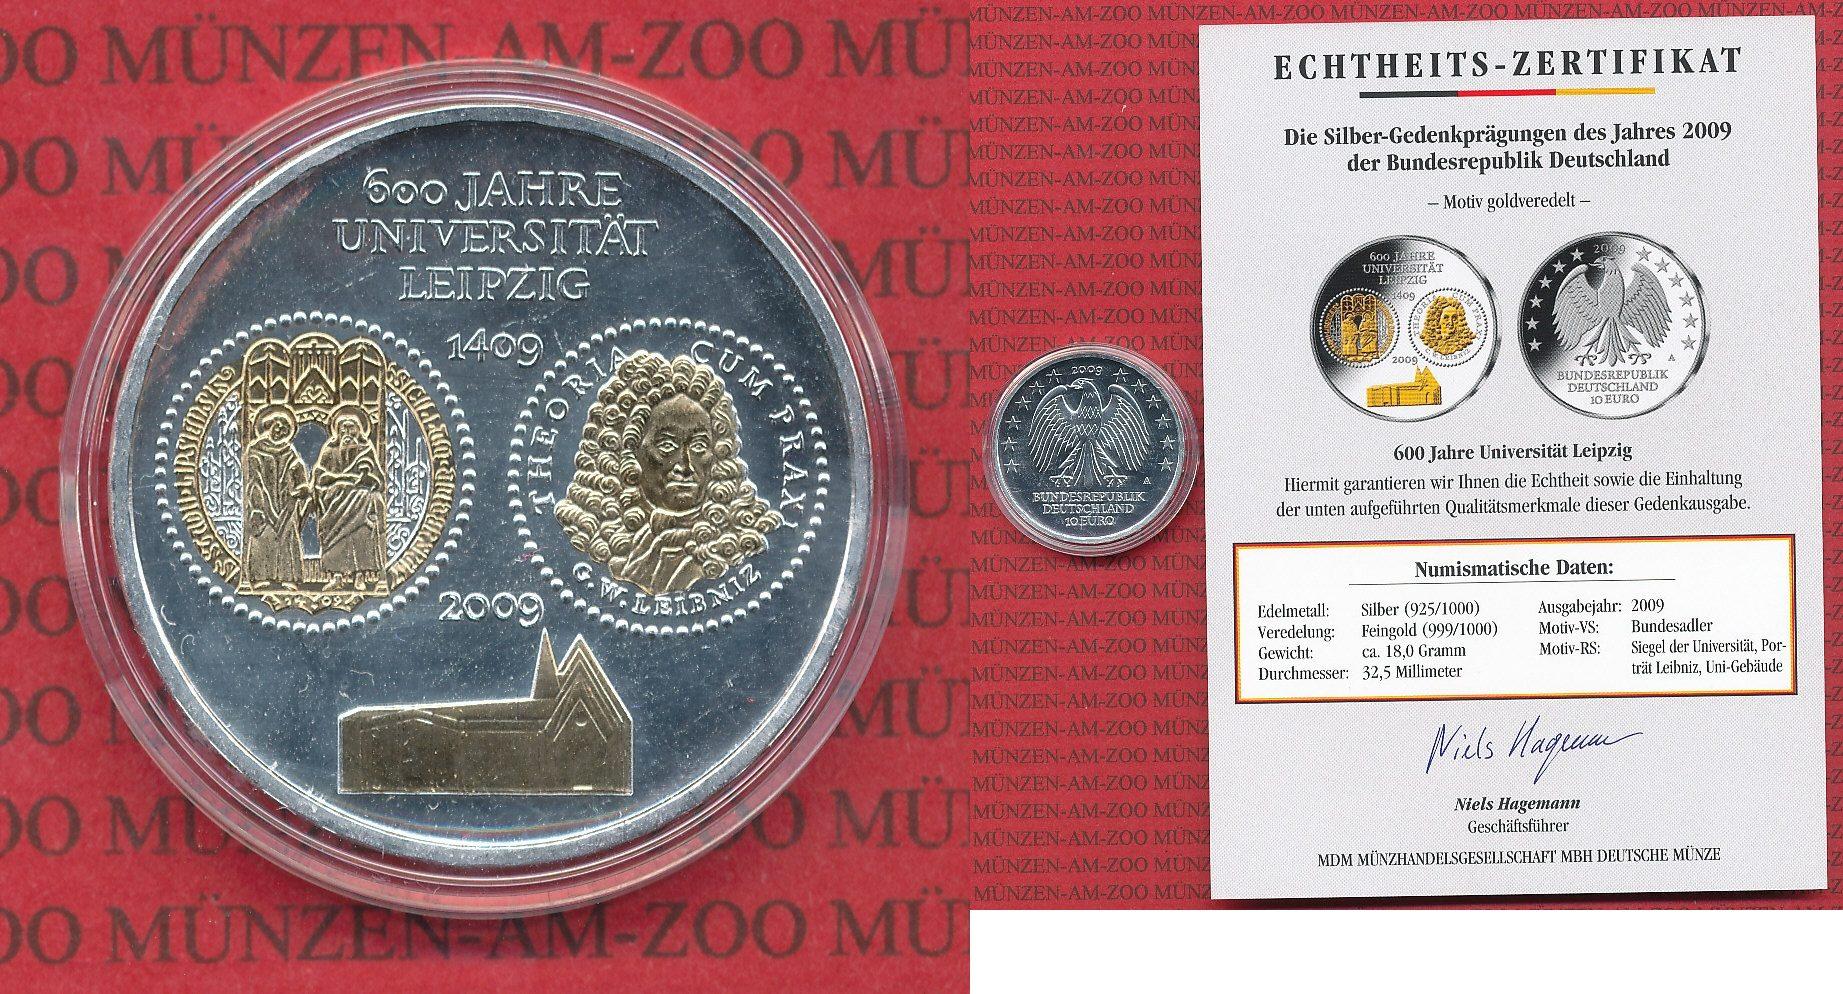 10 Euro Silbermünzemotiv Goldveredelt 2009 Bundesrepublik